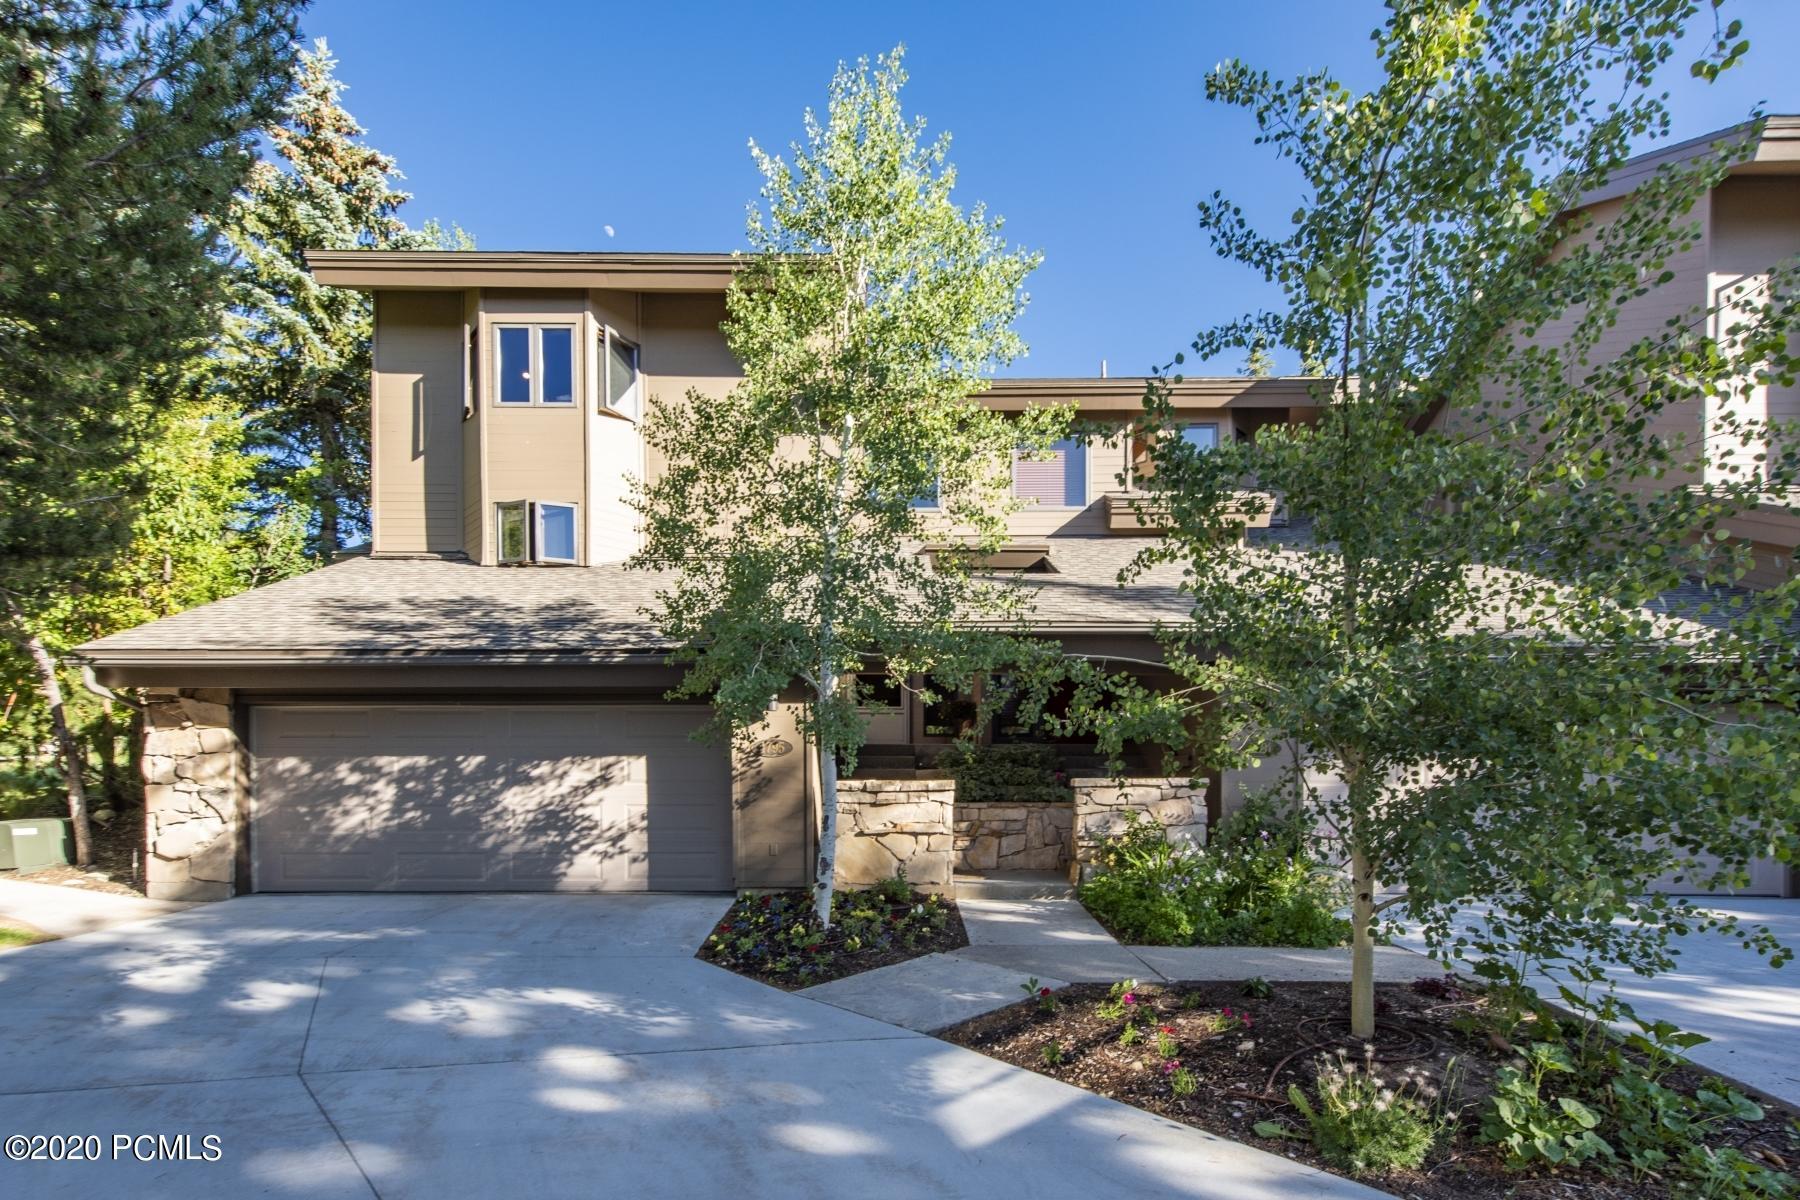 1795 Lakeside Circle, Park City, Utah 84060, 3 Bedrooms Bedrooms, ,3 BathroomsBathrooms,Condominium,For Sale,Lakeside,12005019